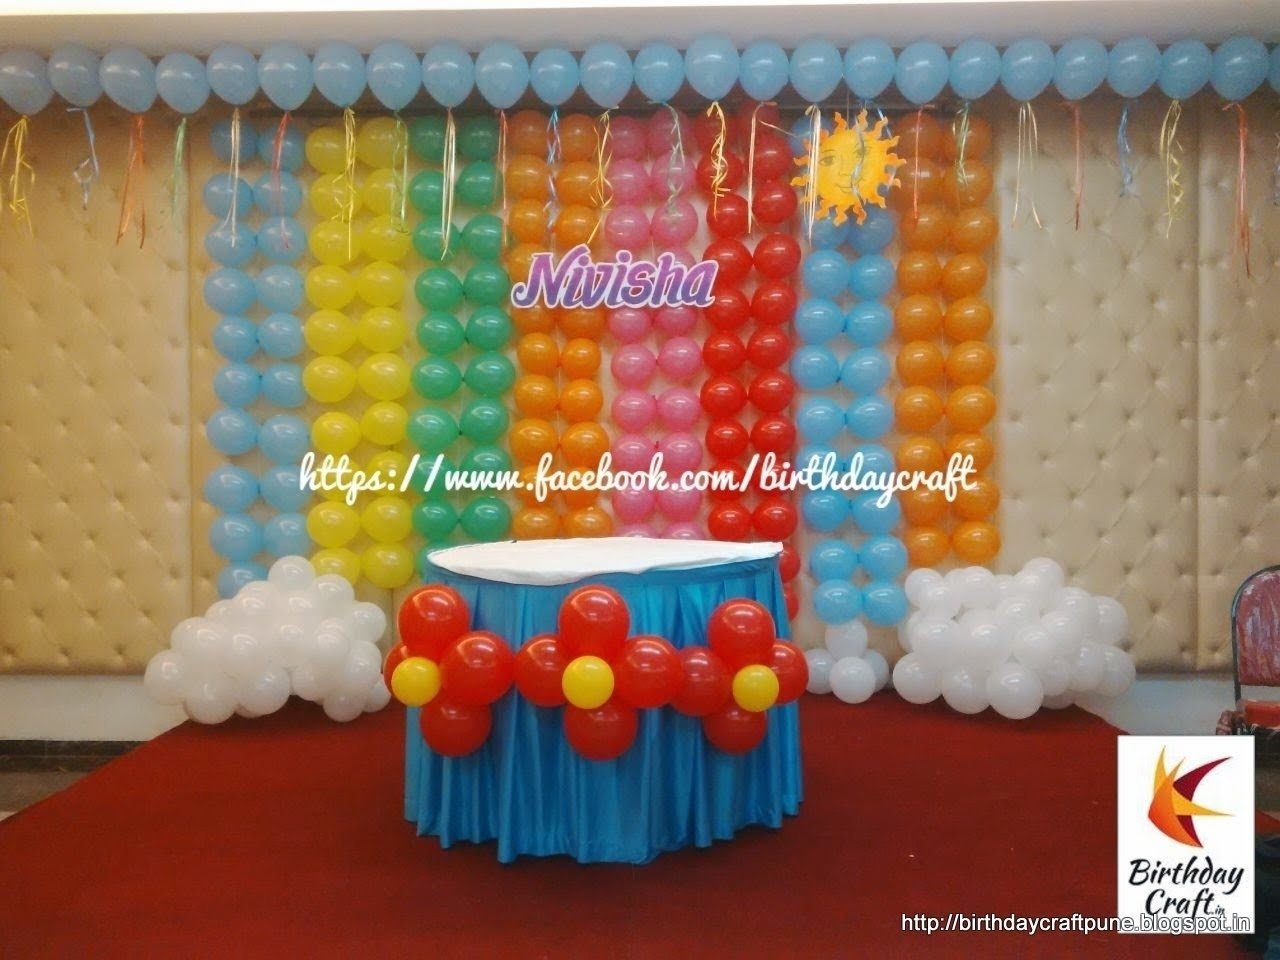 10 Stylish Kids Birthday Party Decoration Ideas Parties Decorations Home Tierra Este 59851